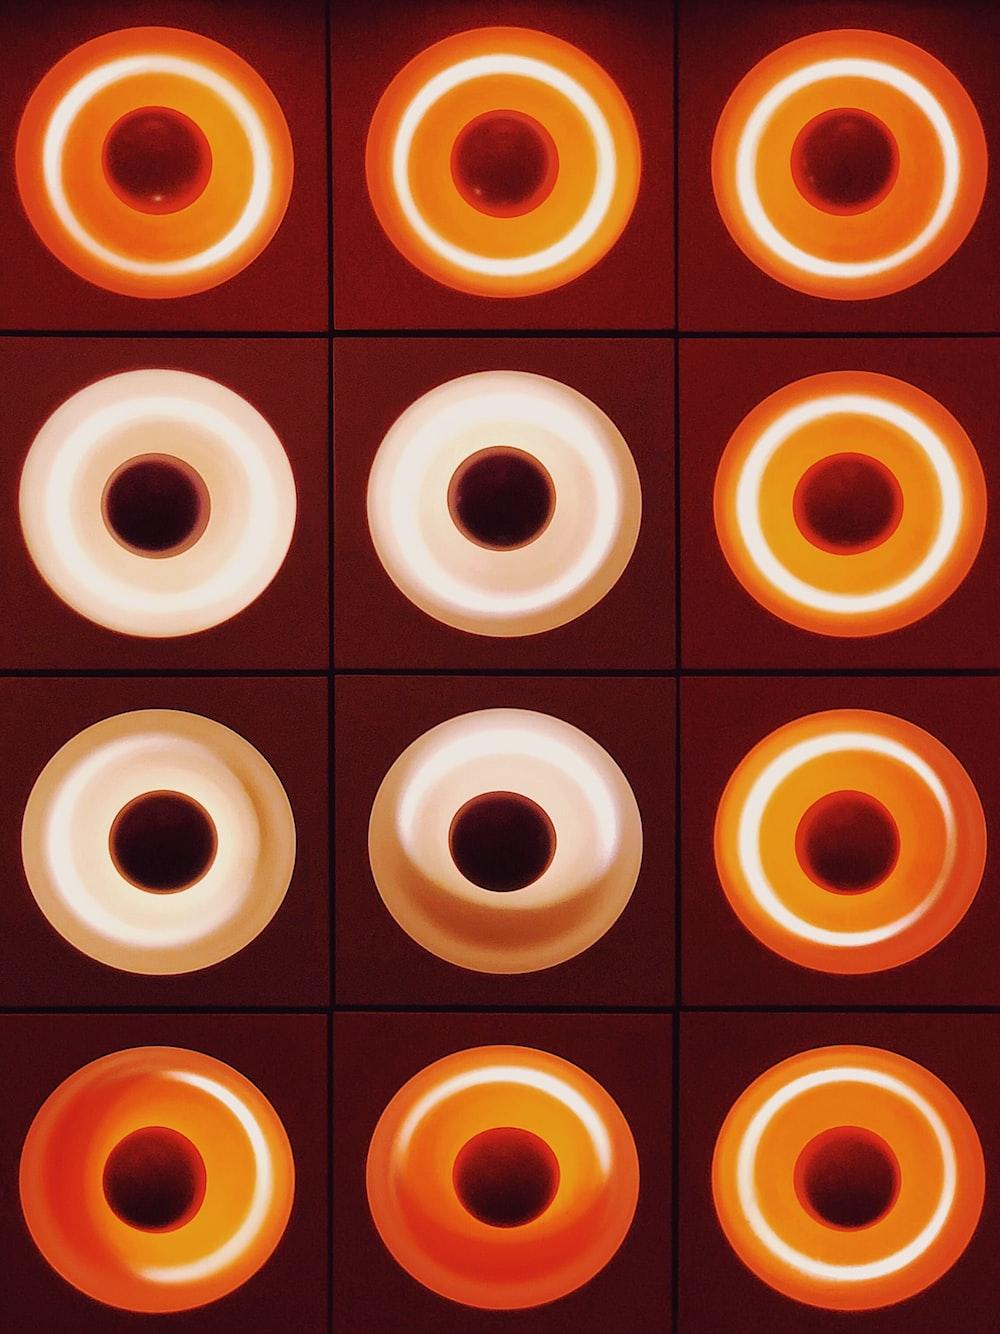 orange and white round wall decor